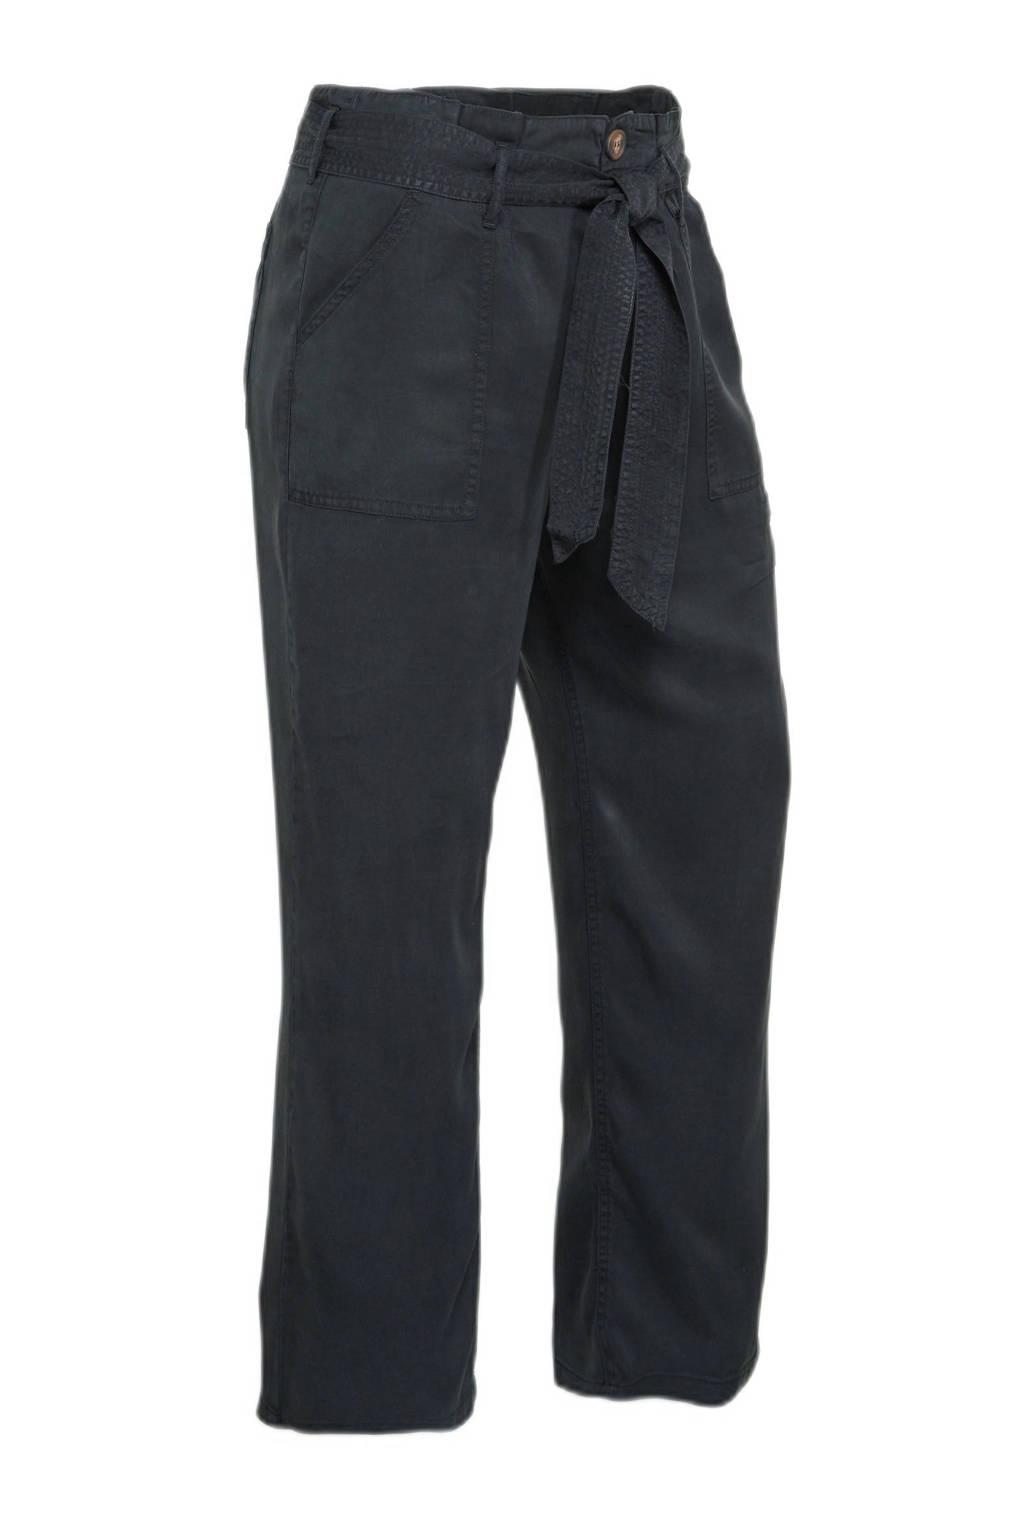 Simply Be wide leg palazzo broek zwart washed, Zwart washed